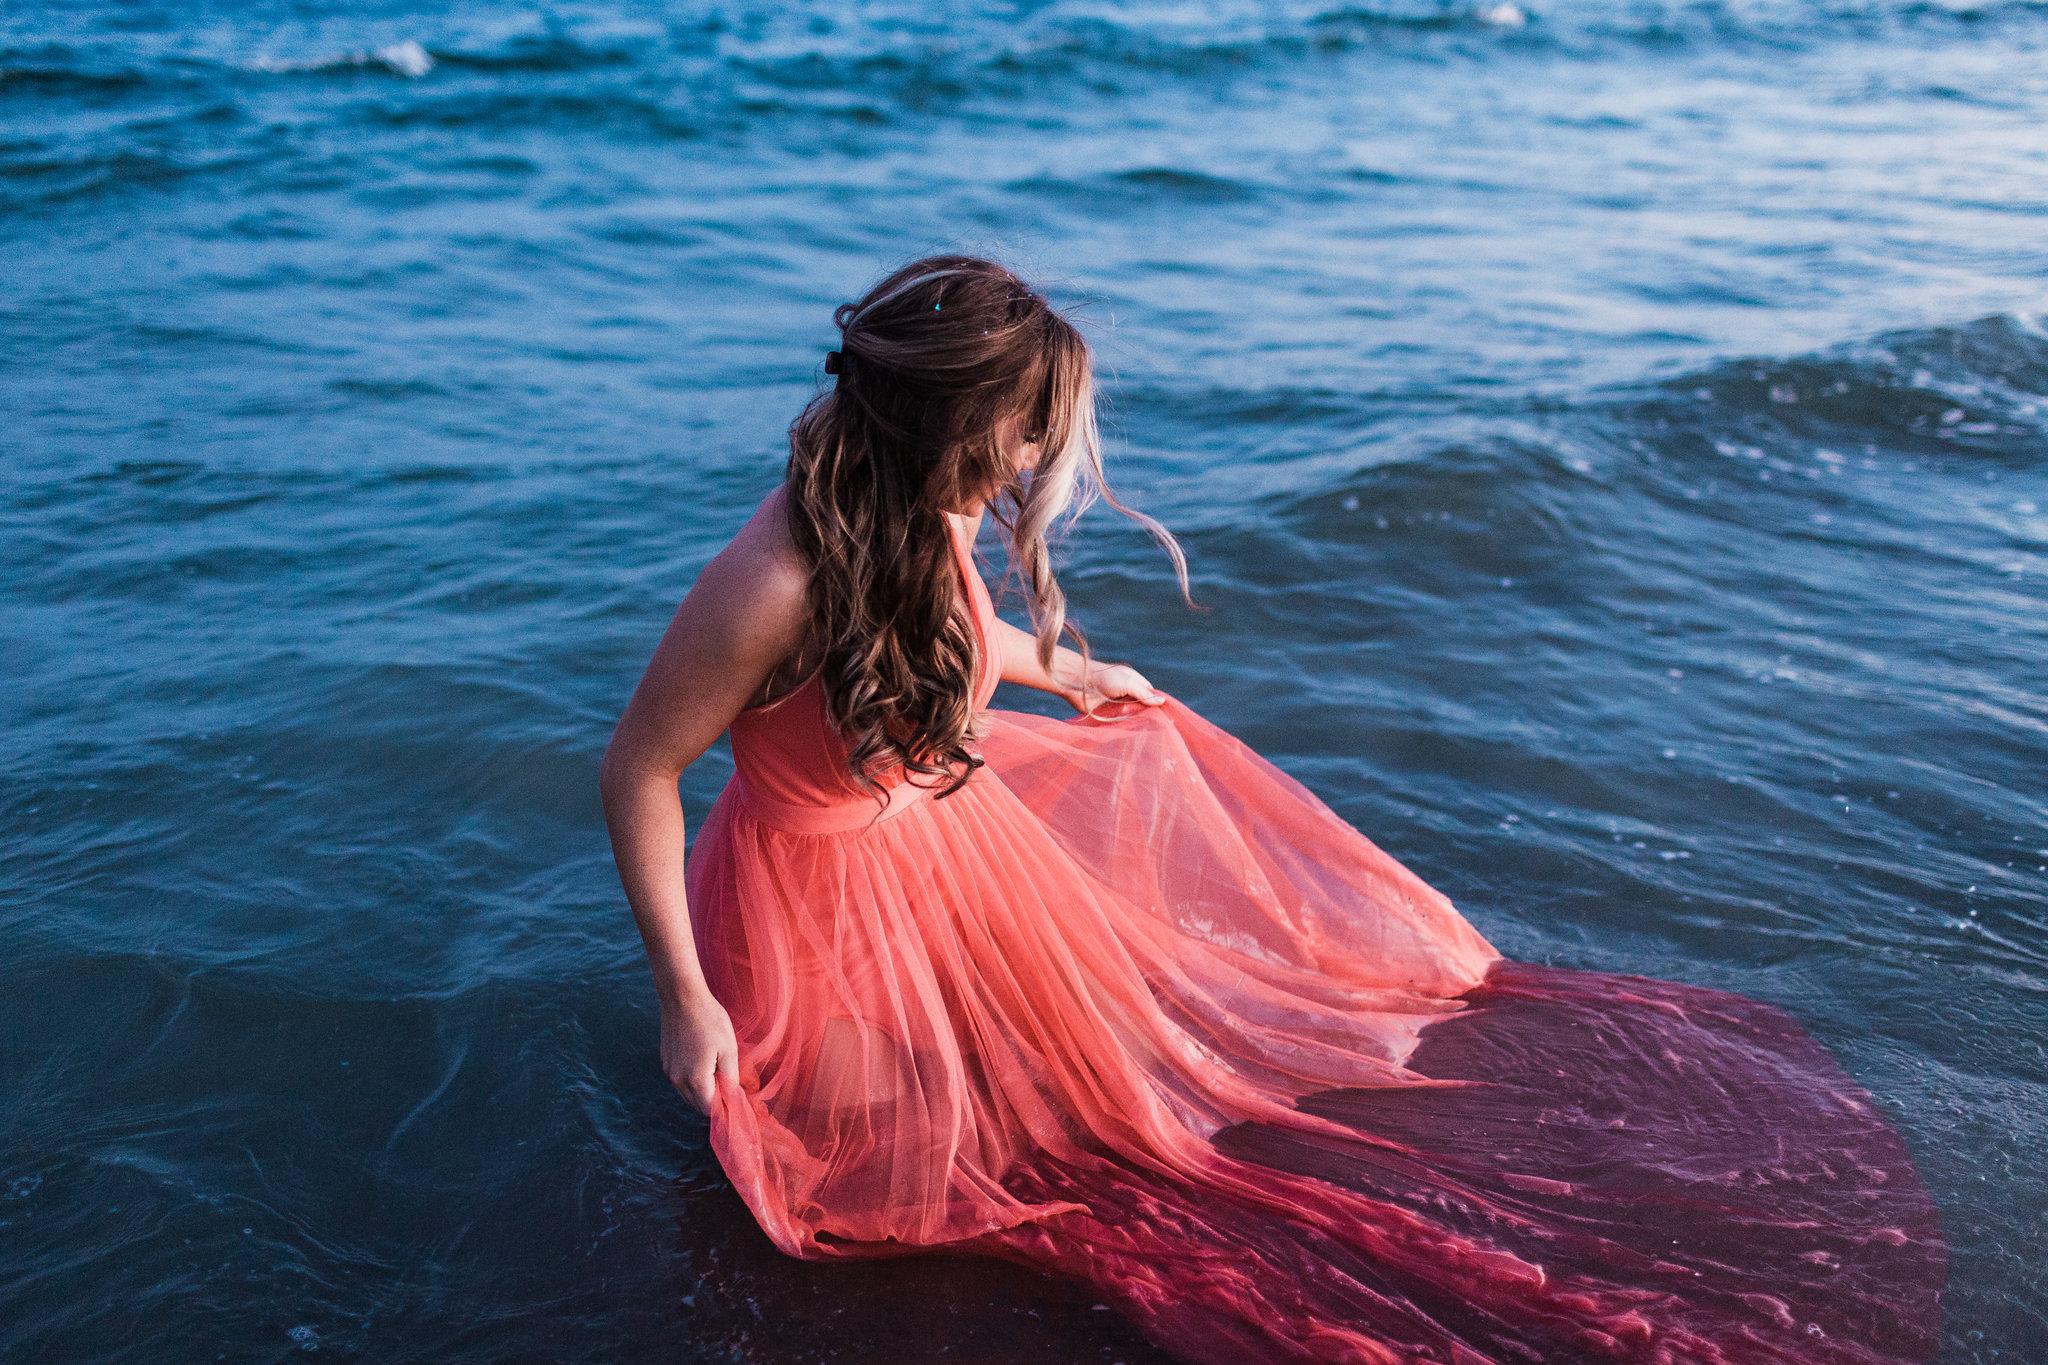 Erin-kevin-apt-b-photography-tybee-island-engagement-photoshoot-savannah-engagement-savannah-wedding-savannah-wedding-photographer-tybee-island-wedding-beach-engagement-tybee-island-sunset-27.jpg